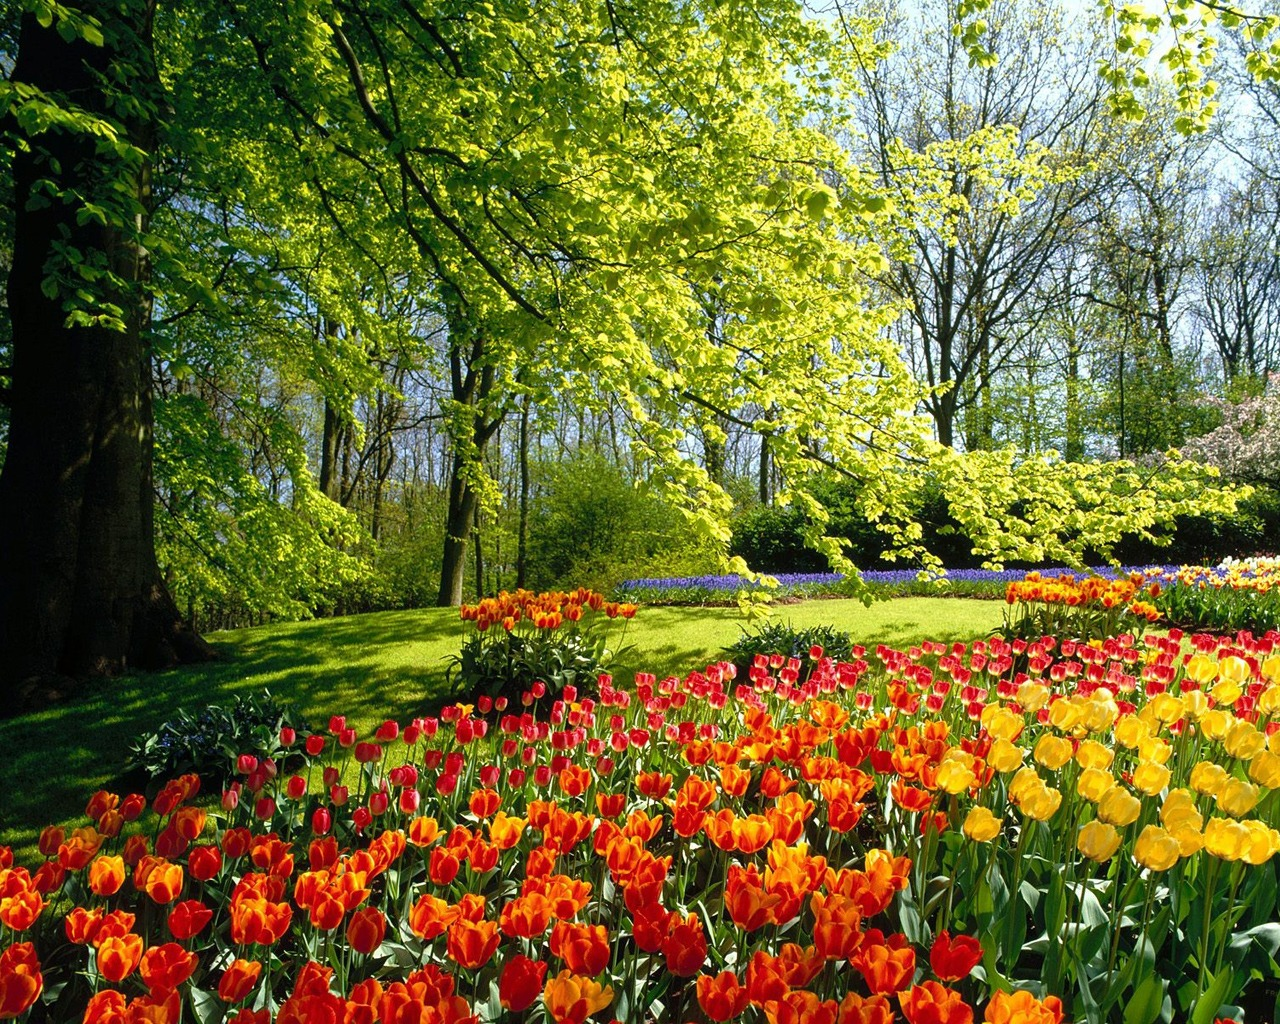 cute spring wallpaper cute spring wallpaper cute spring wallpaper cute 1280x1024